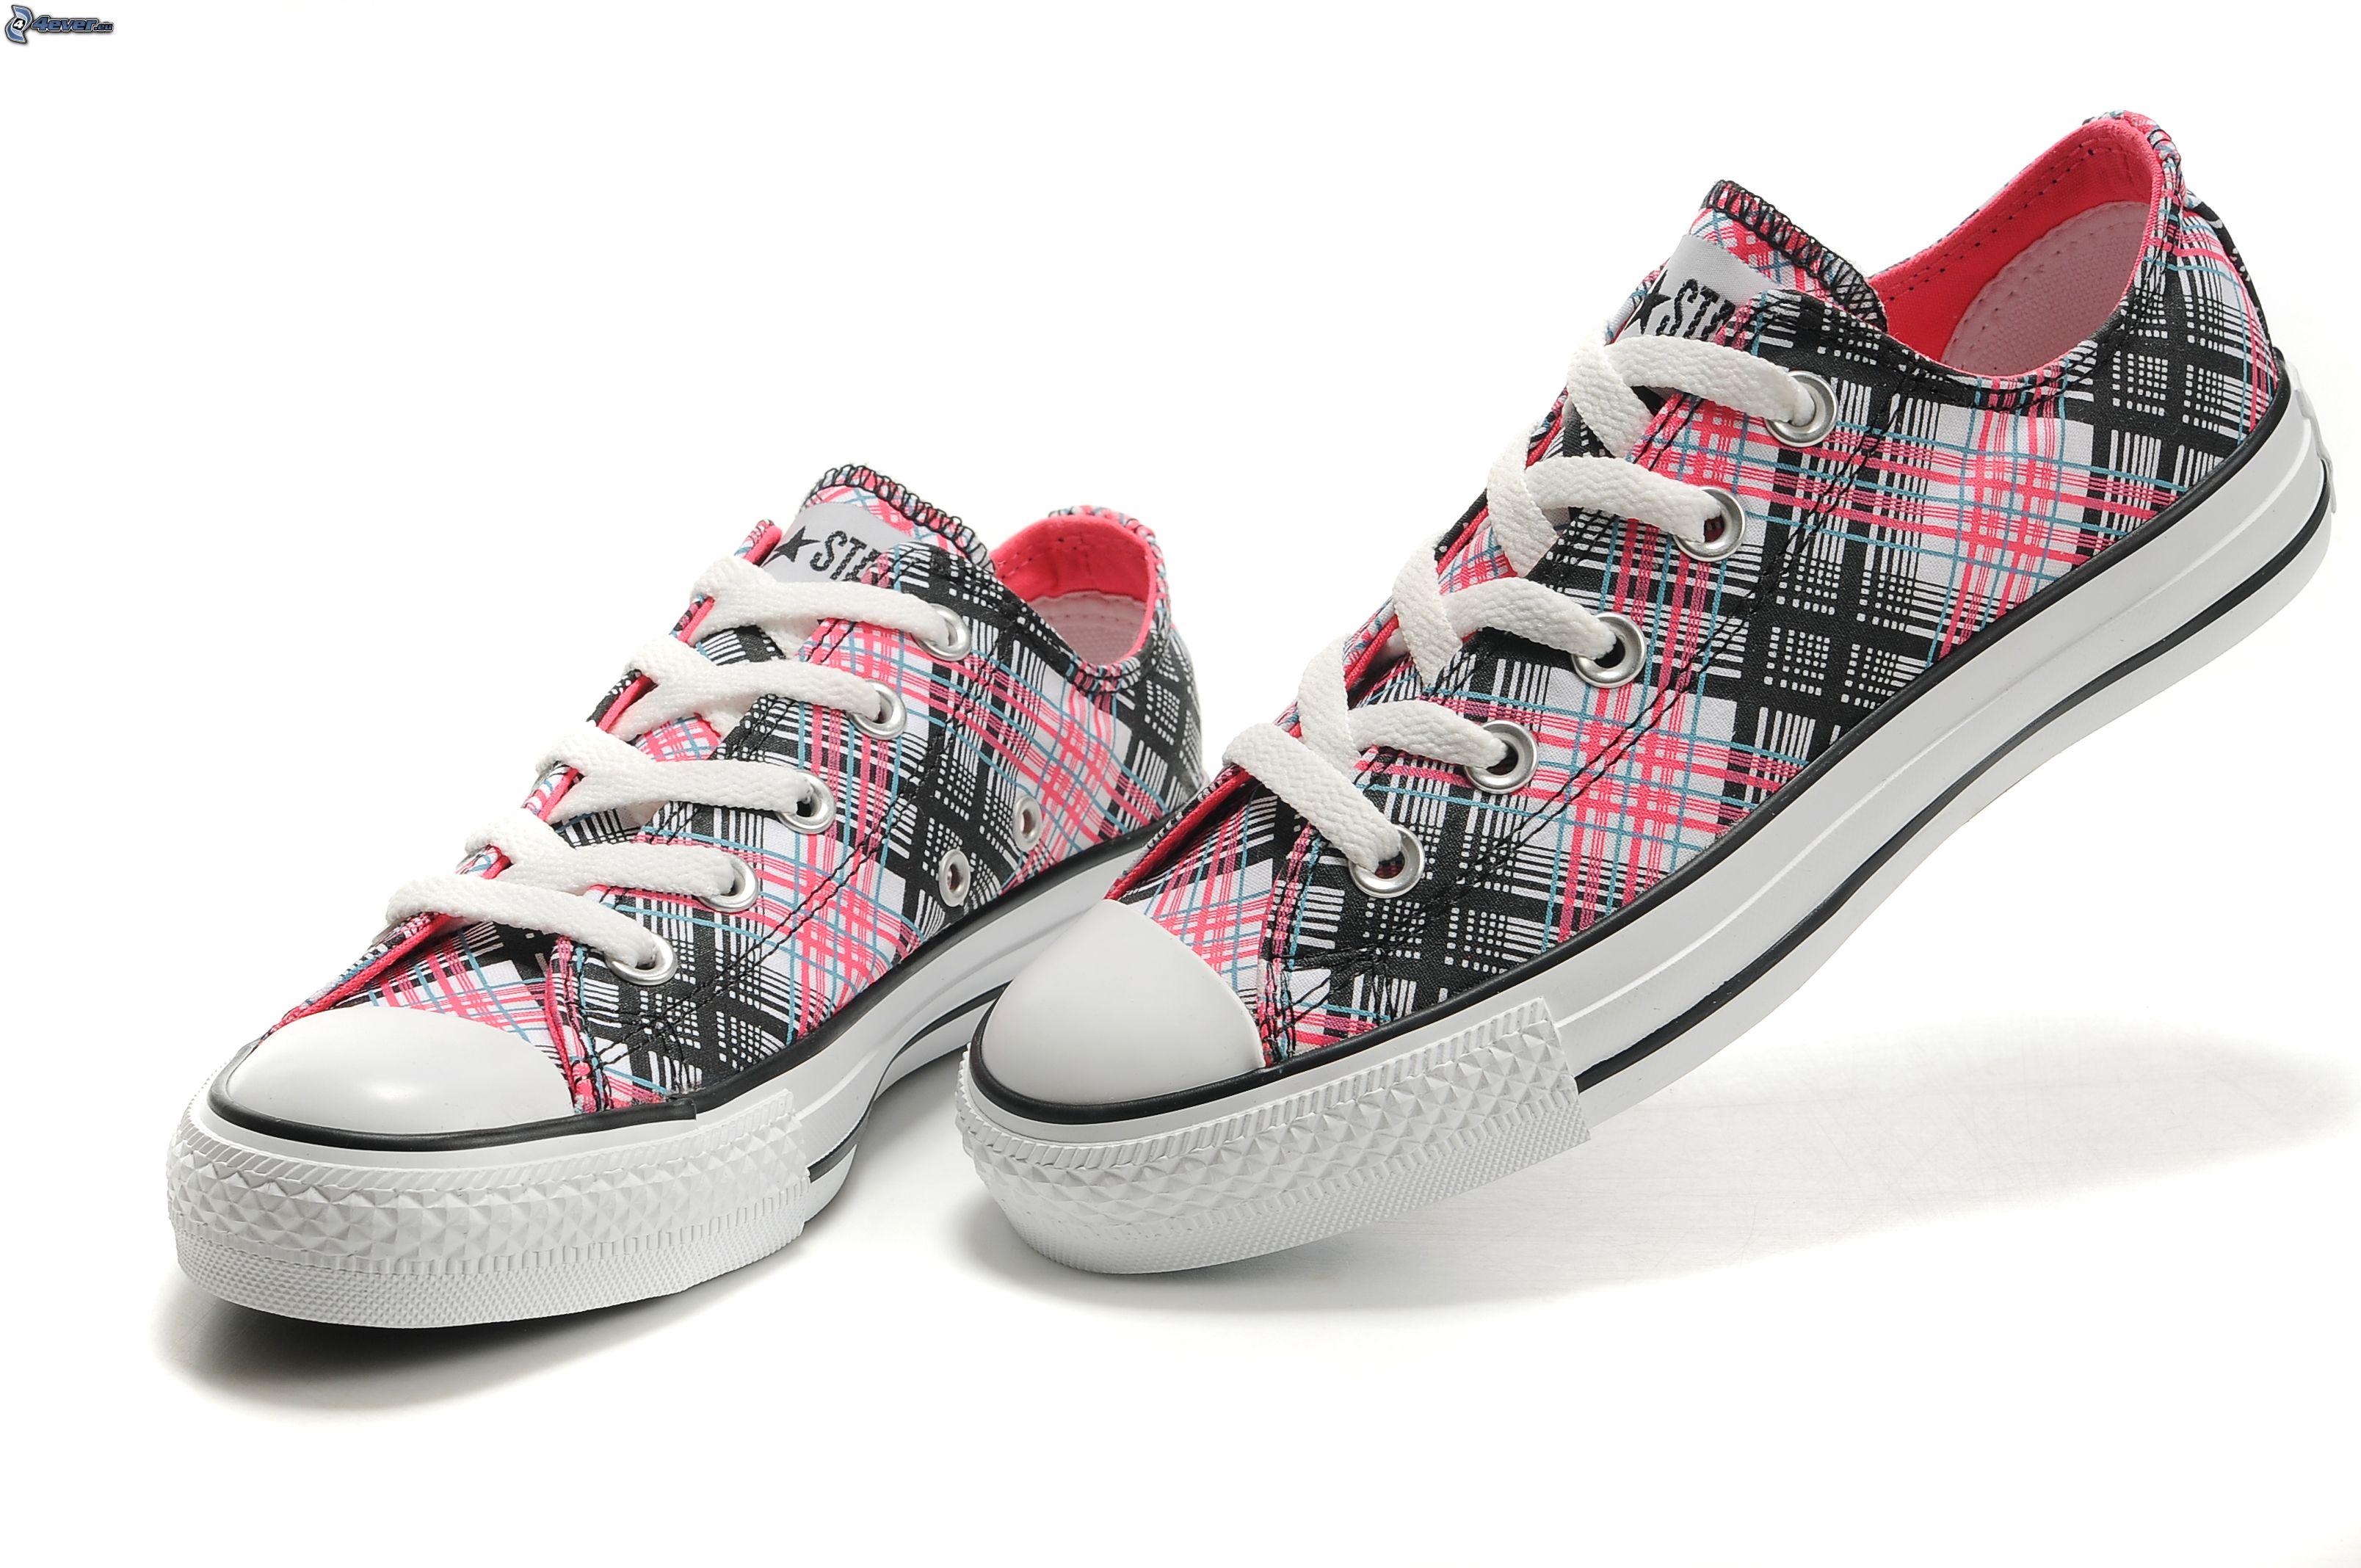 Zapatos Deportivos Converse Converse Converse Zapatos Deportivos Zapatos Deportivos Zapatos 7Pq4Pw